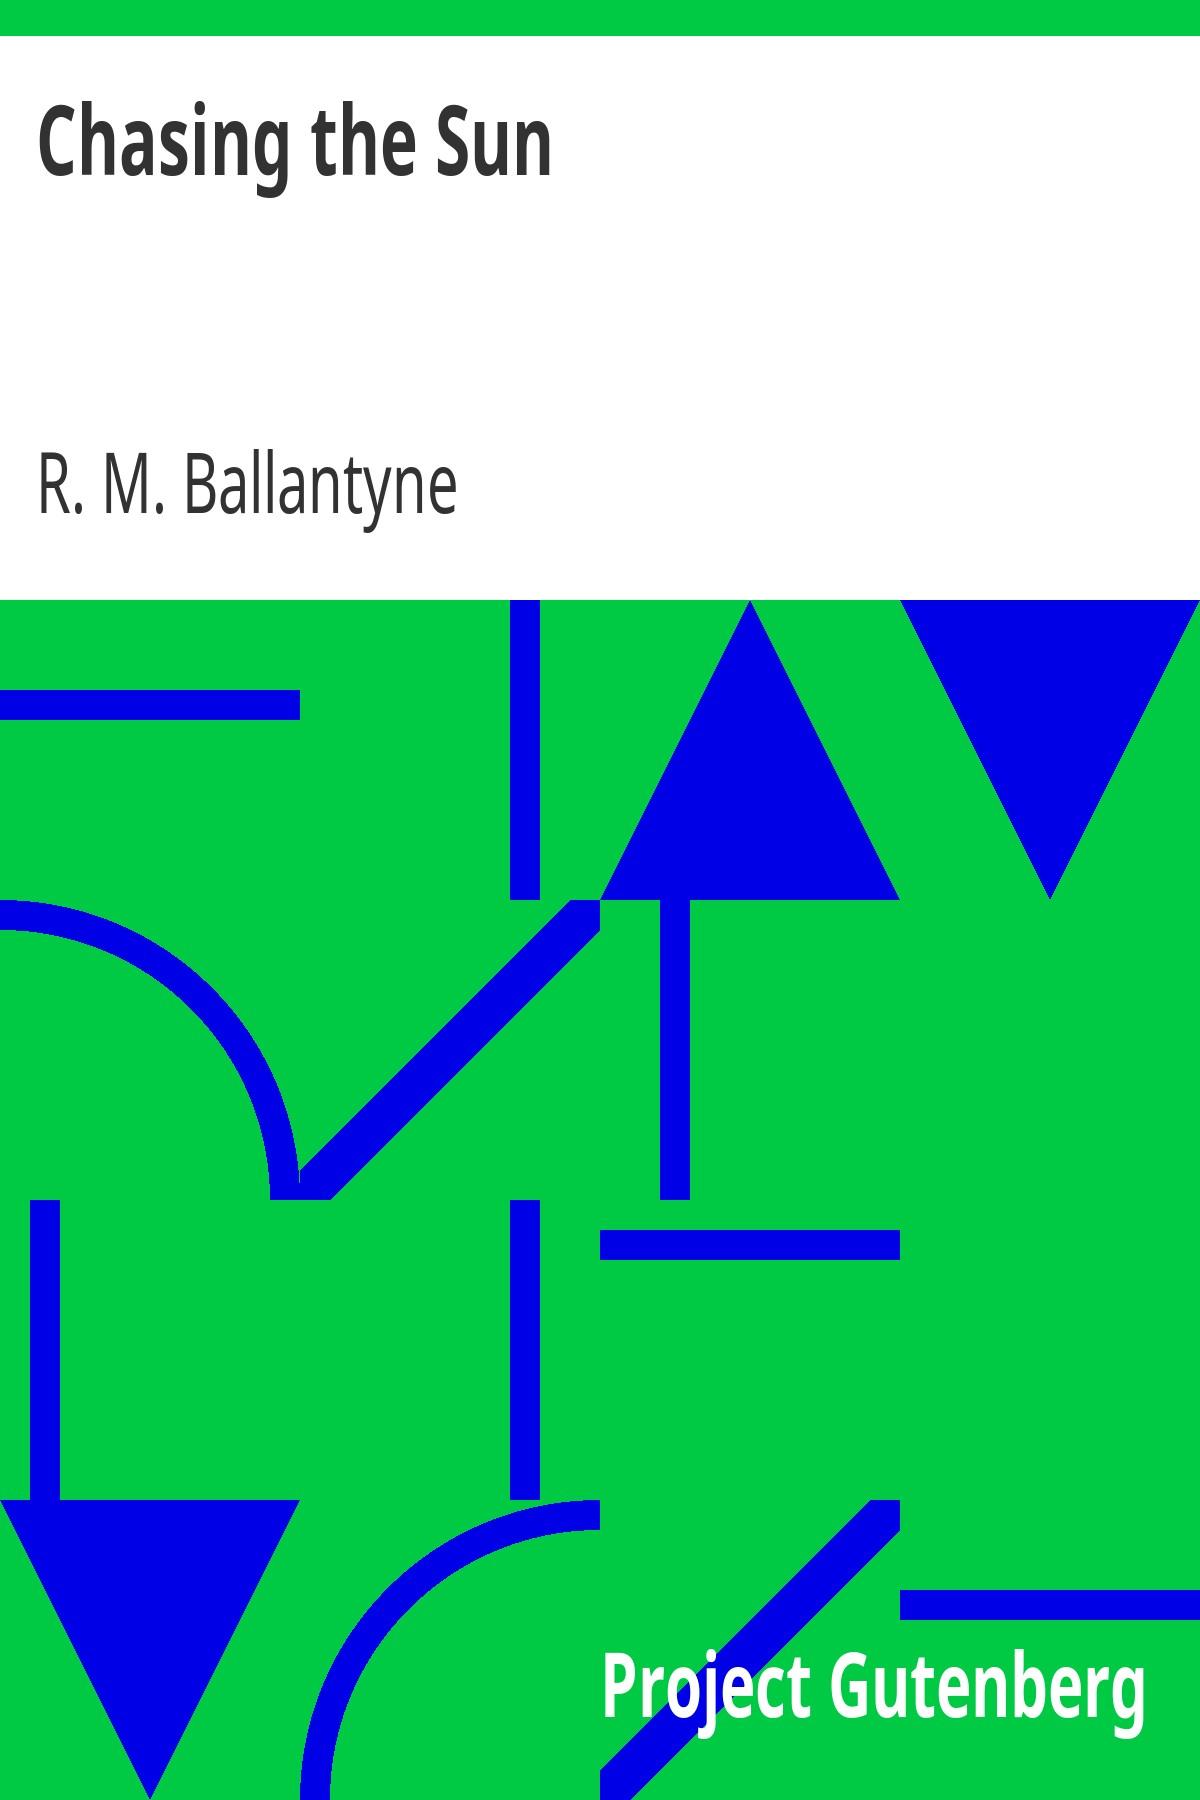 R. M. Ballantyne Chasing the Sun